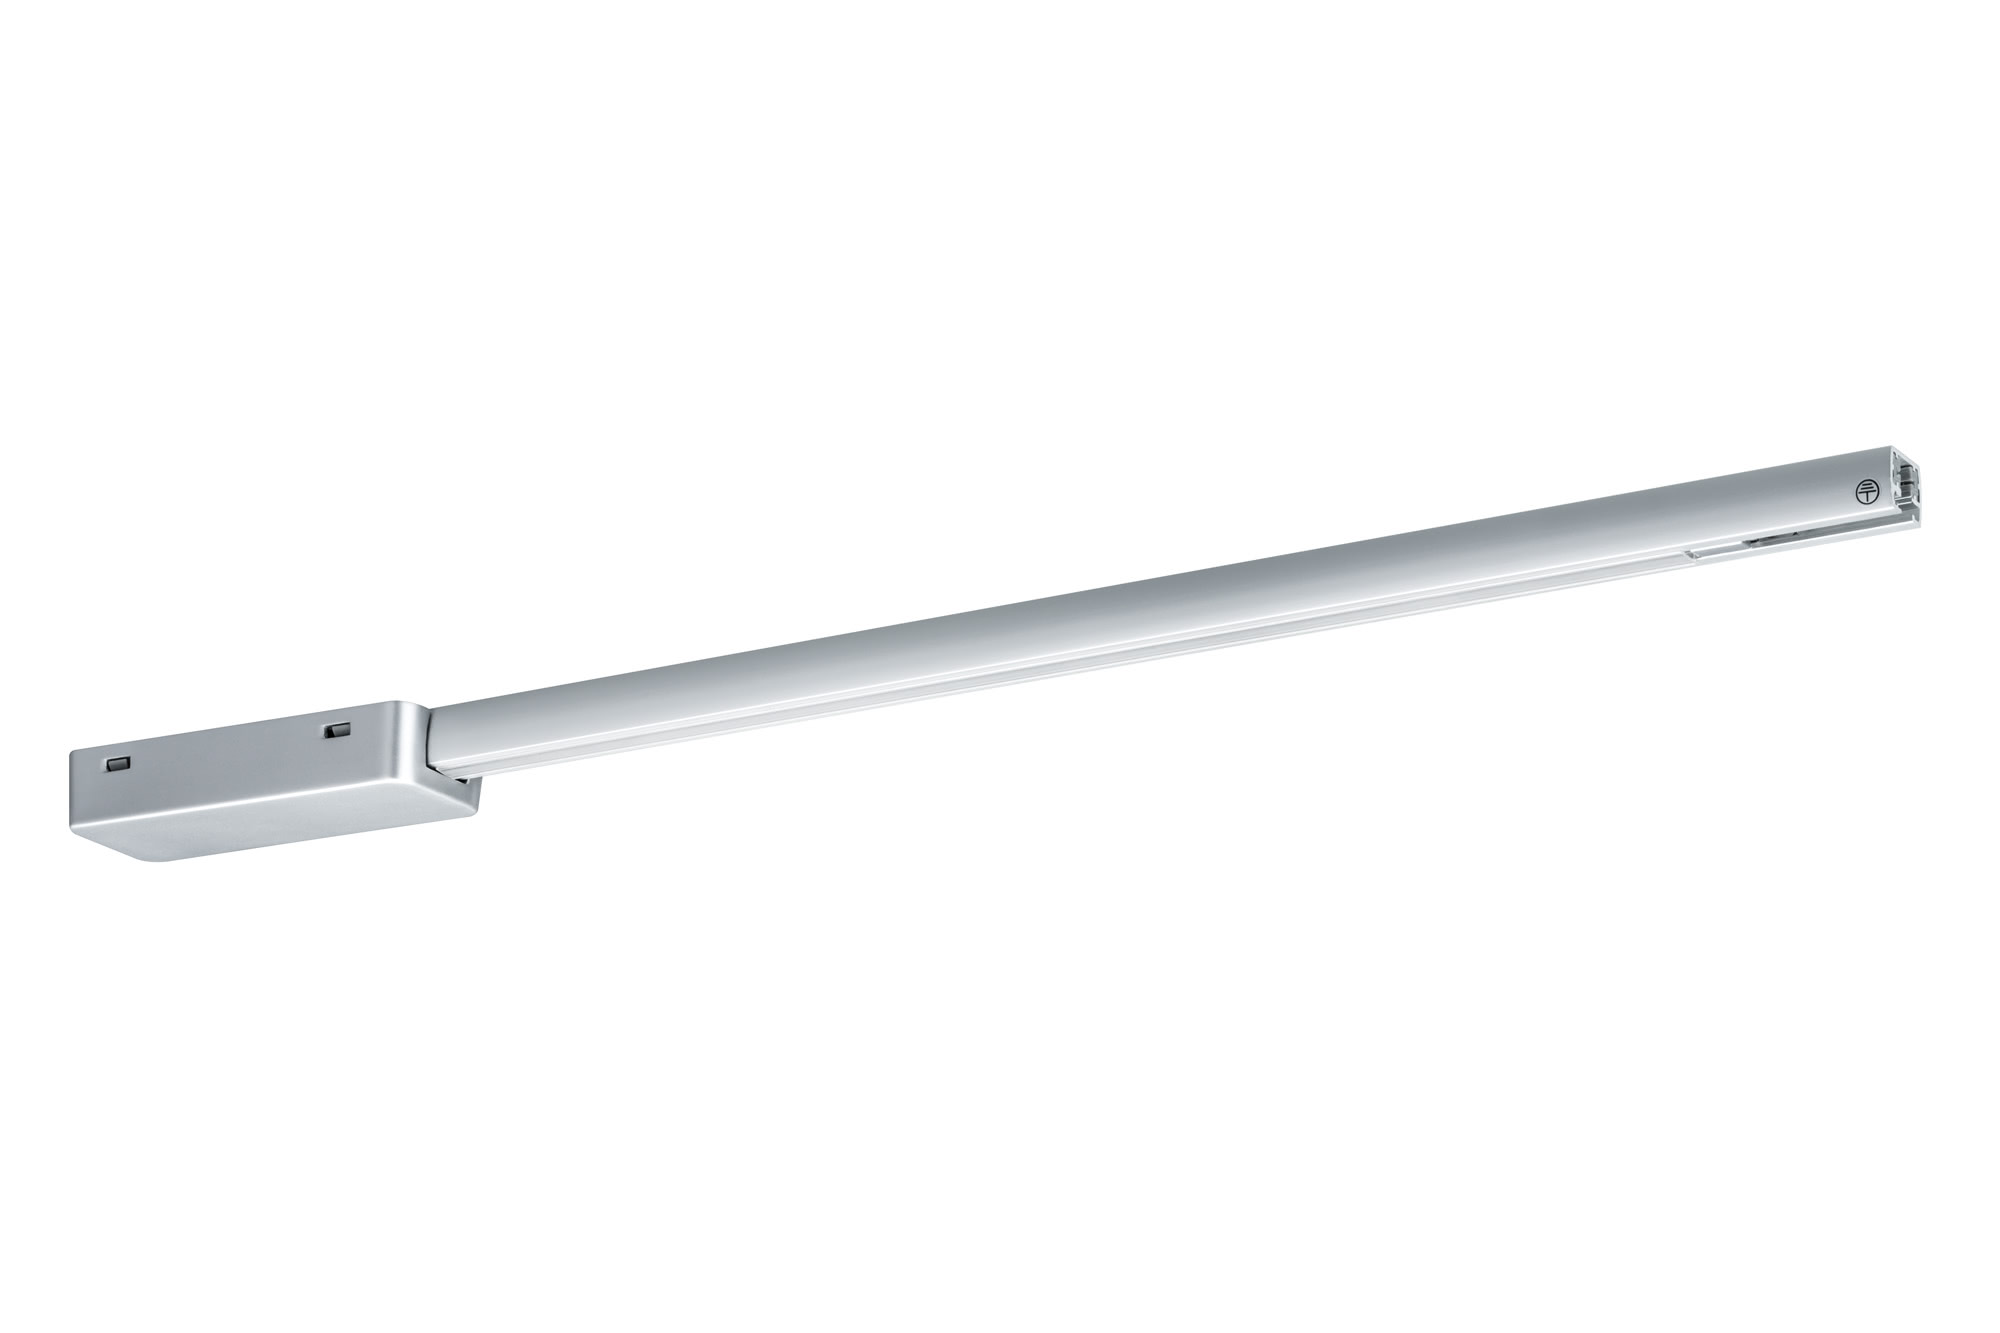 Paulmann. 95124 Подвод питания URail L+E TeleskopEinspeisung 50cm, хром матовый